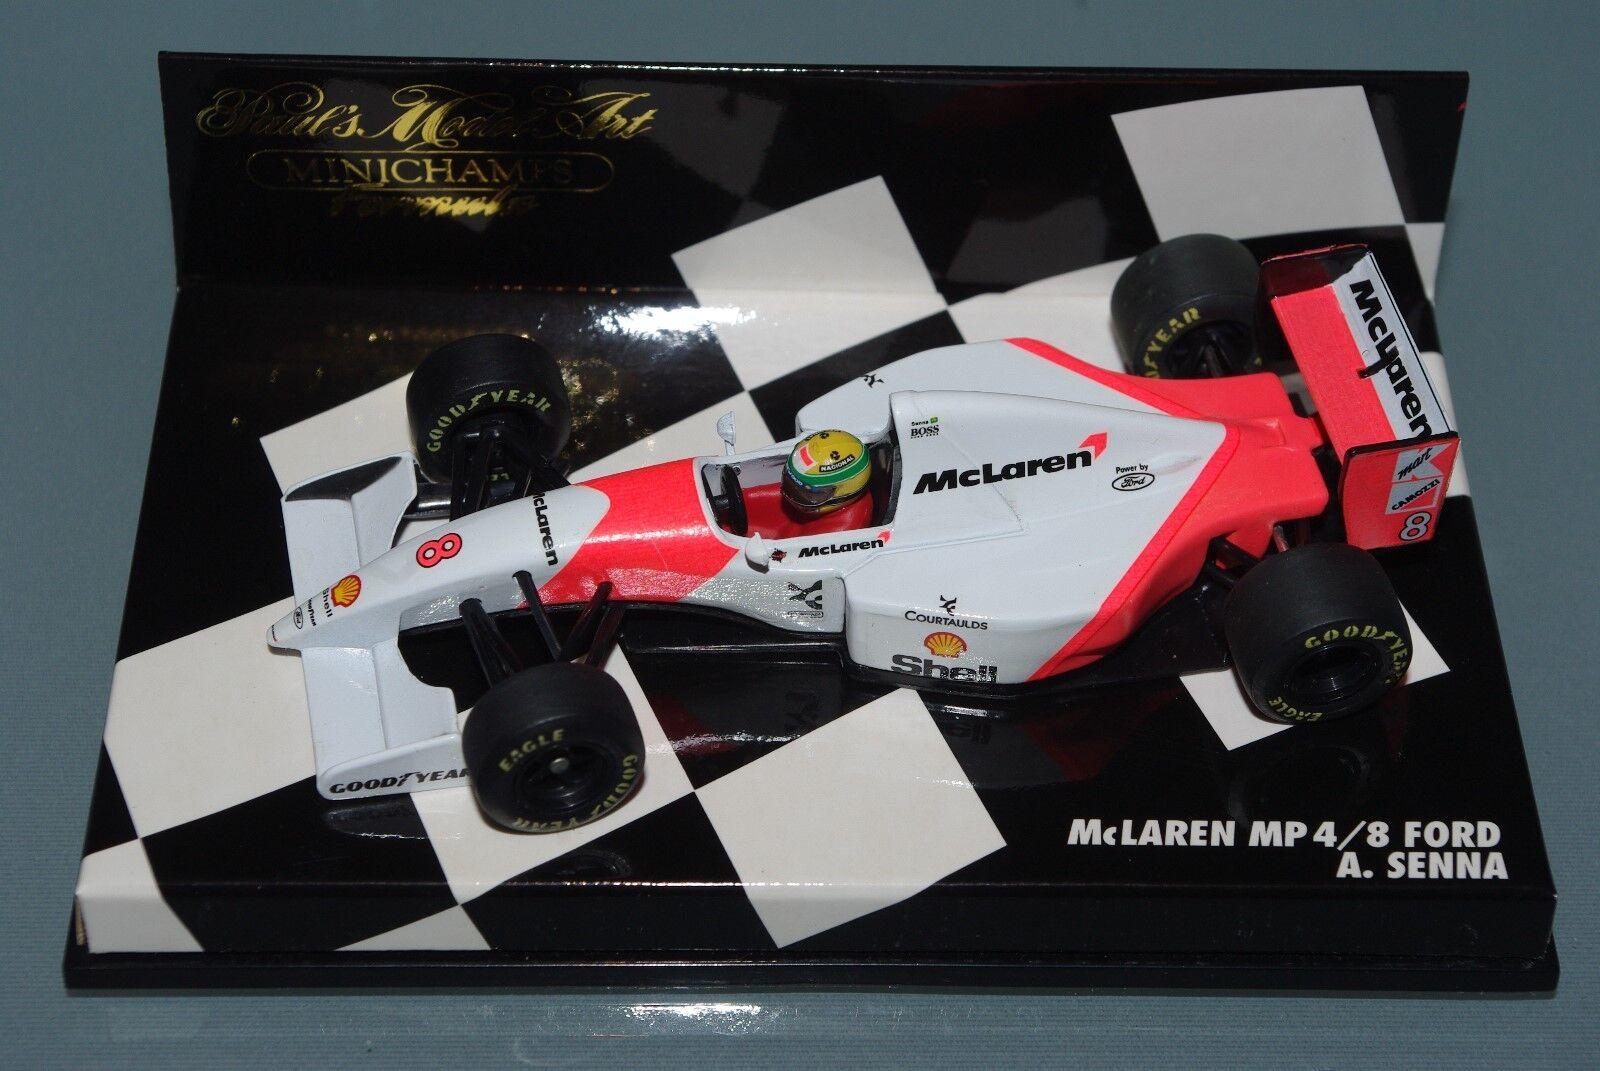 Minichamps F1 1 43 McLAREN FORD MP4 8 - Ayrton Senna-chequerbox Edition